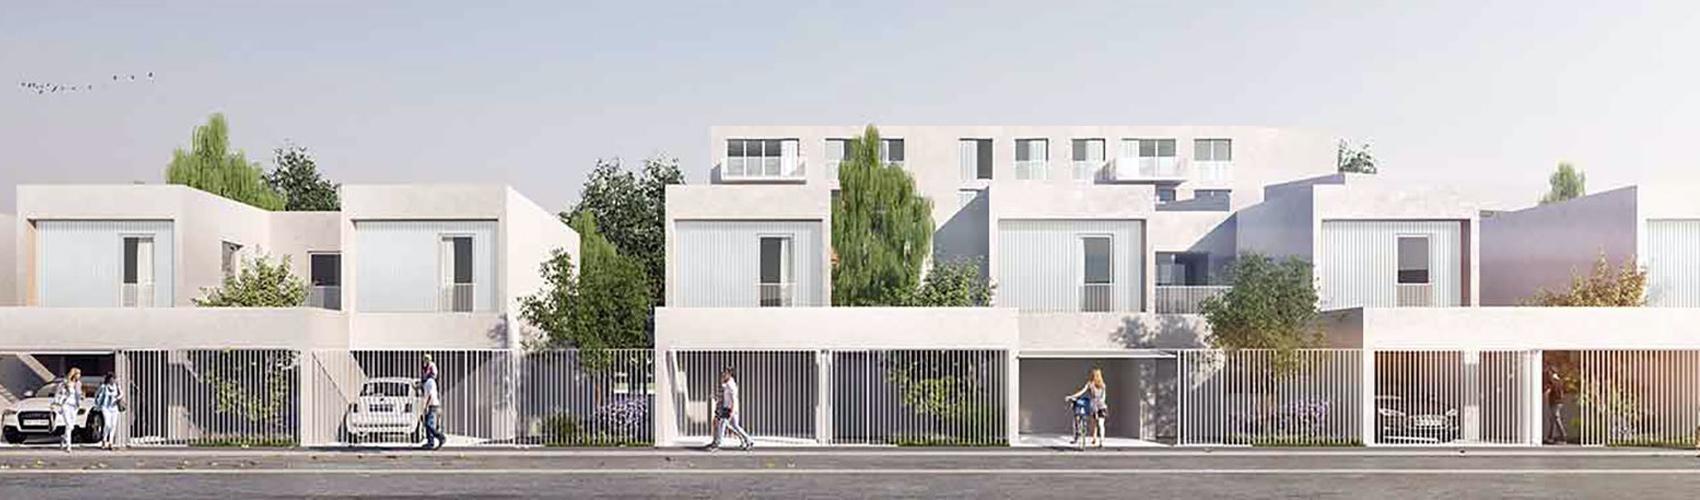 Photo du programme immobilier neuf DKQ-1500 à Dunkerque